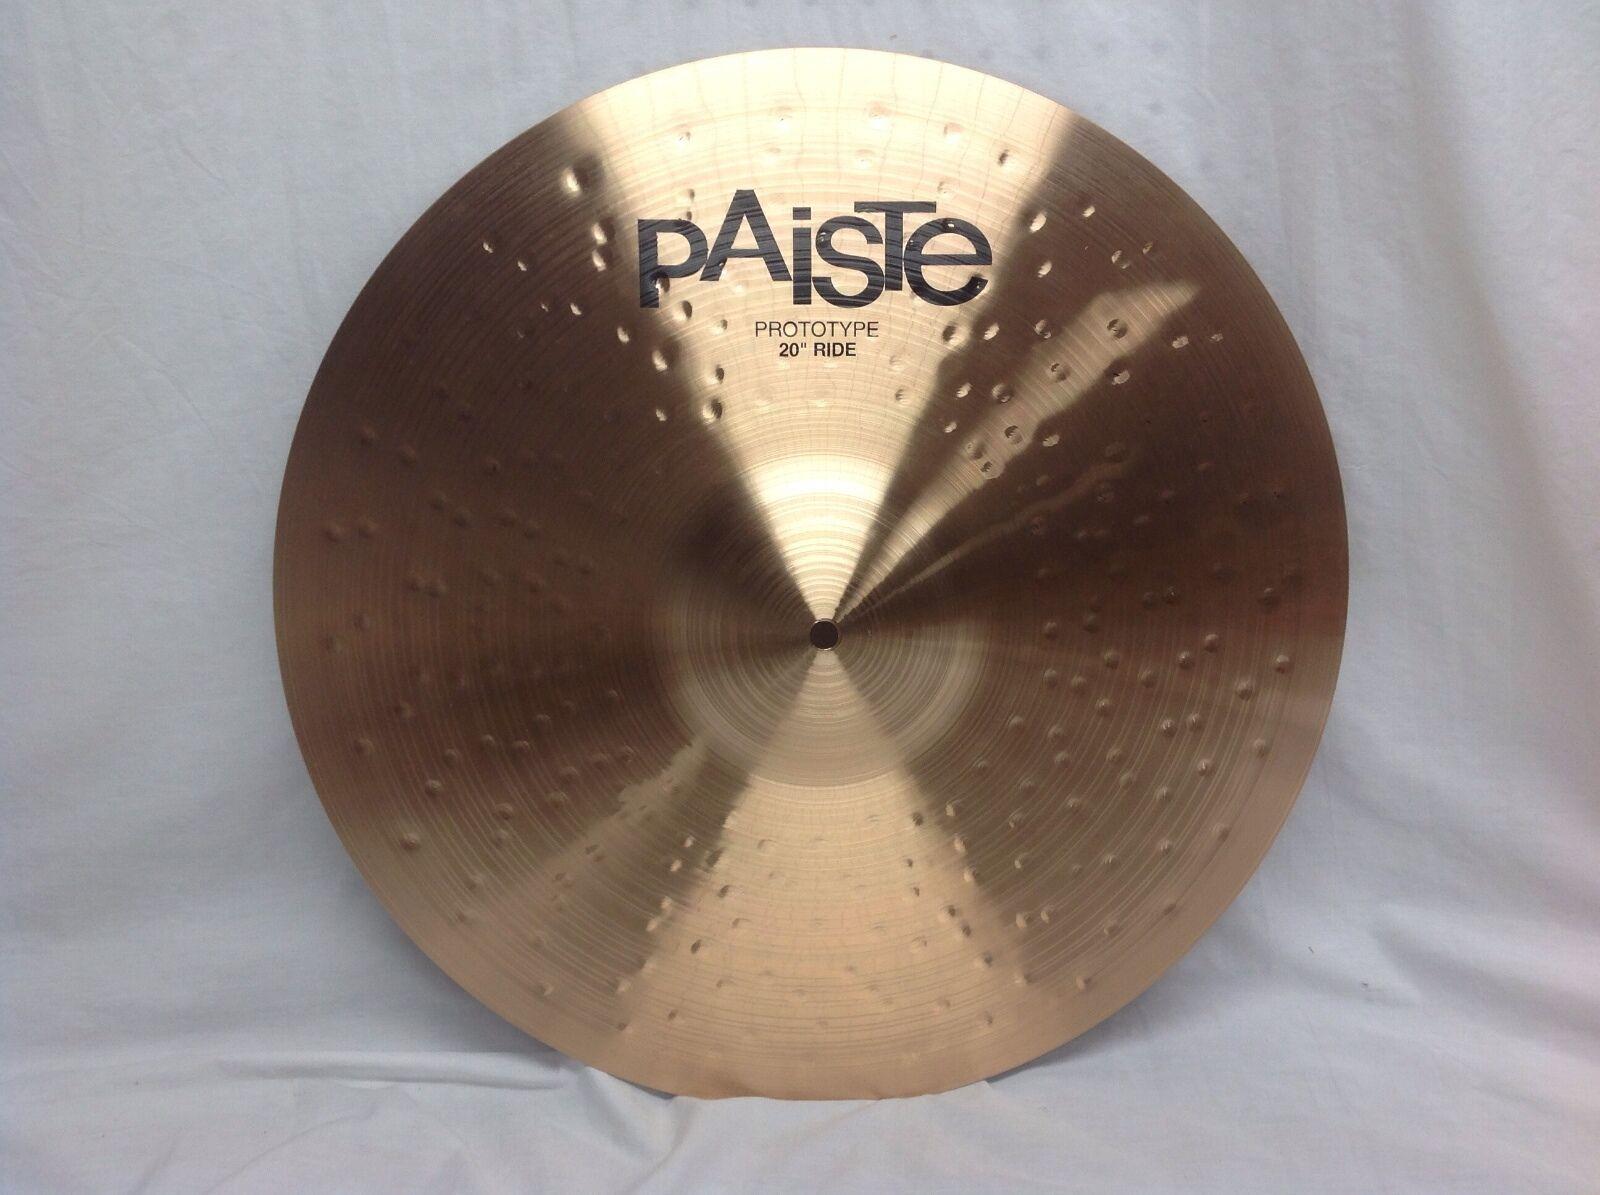 PAISTE T20 20  Medium Ride Cymbal New Prototype Model Warranty 2141 Grams(1002)